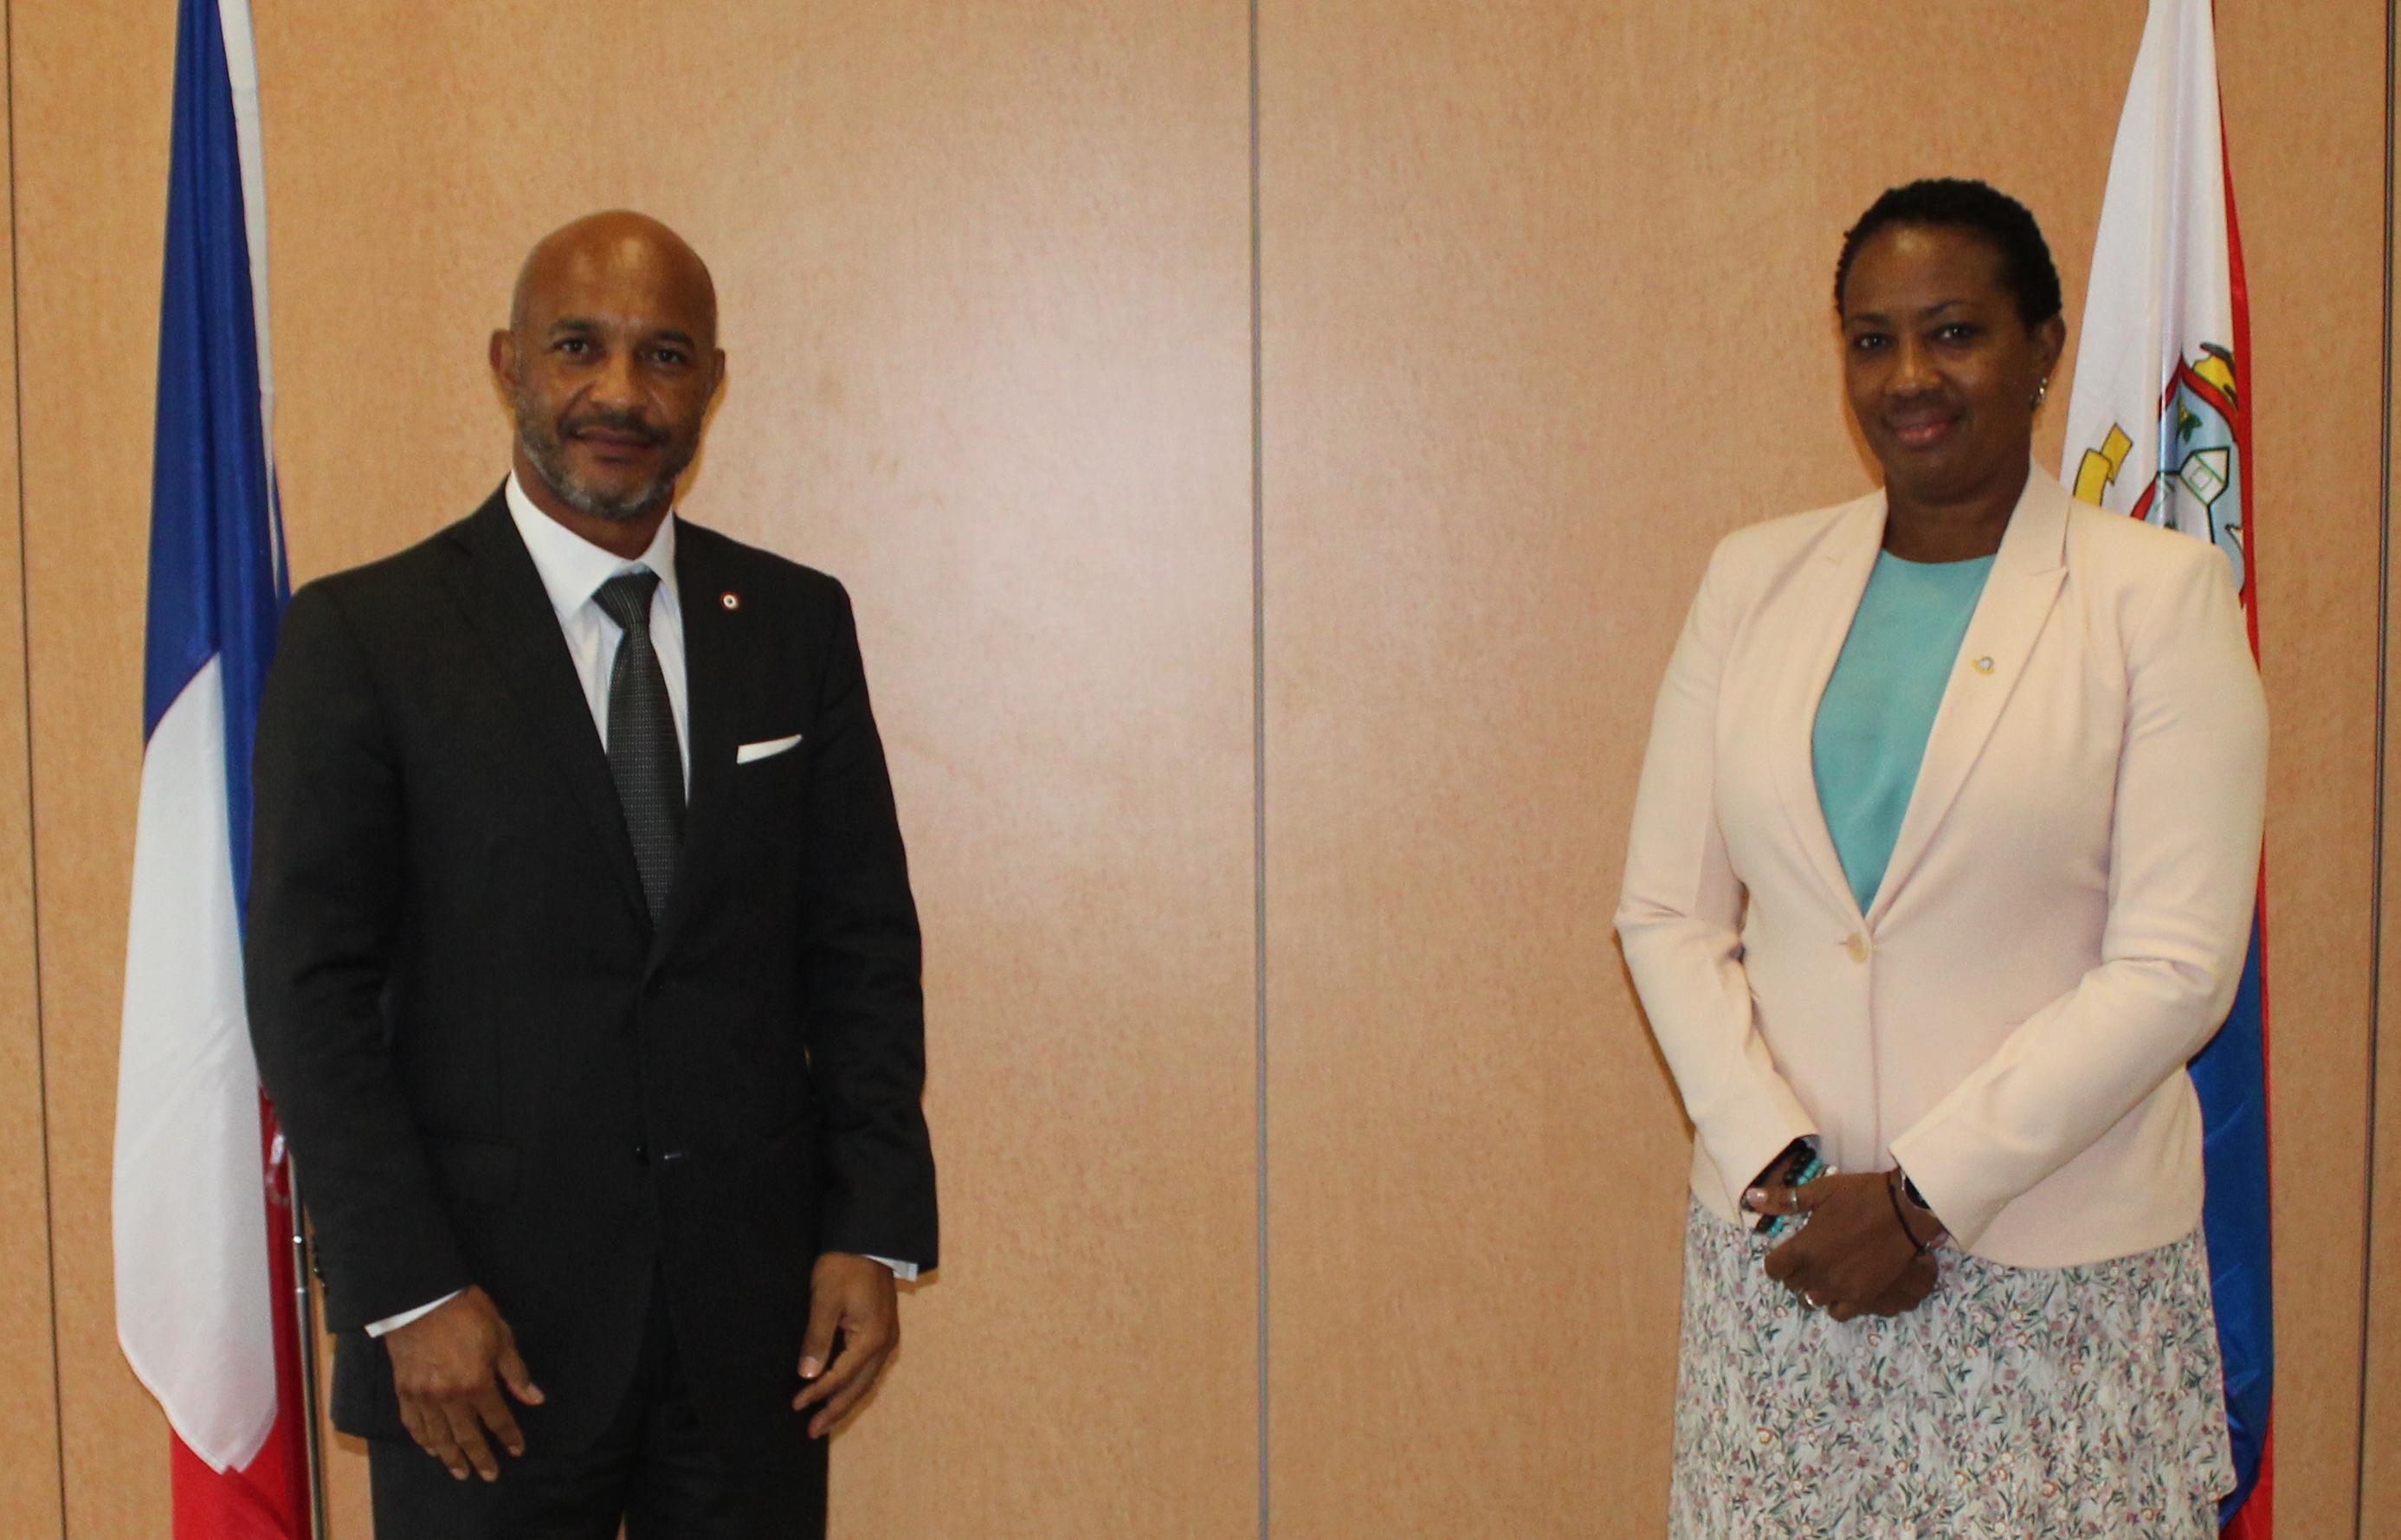 Saint-Martin : Vers un renforcement de la coopération avec Sint-Maarten